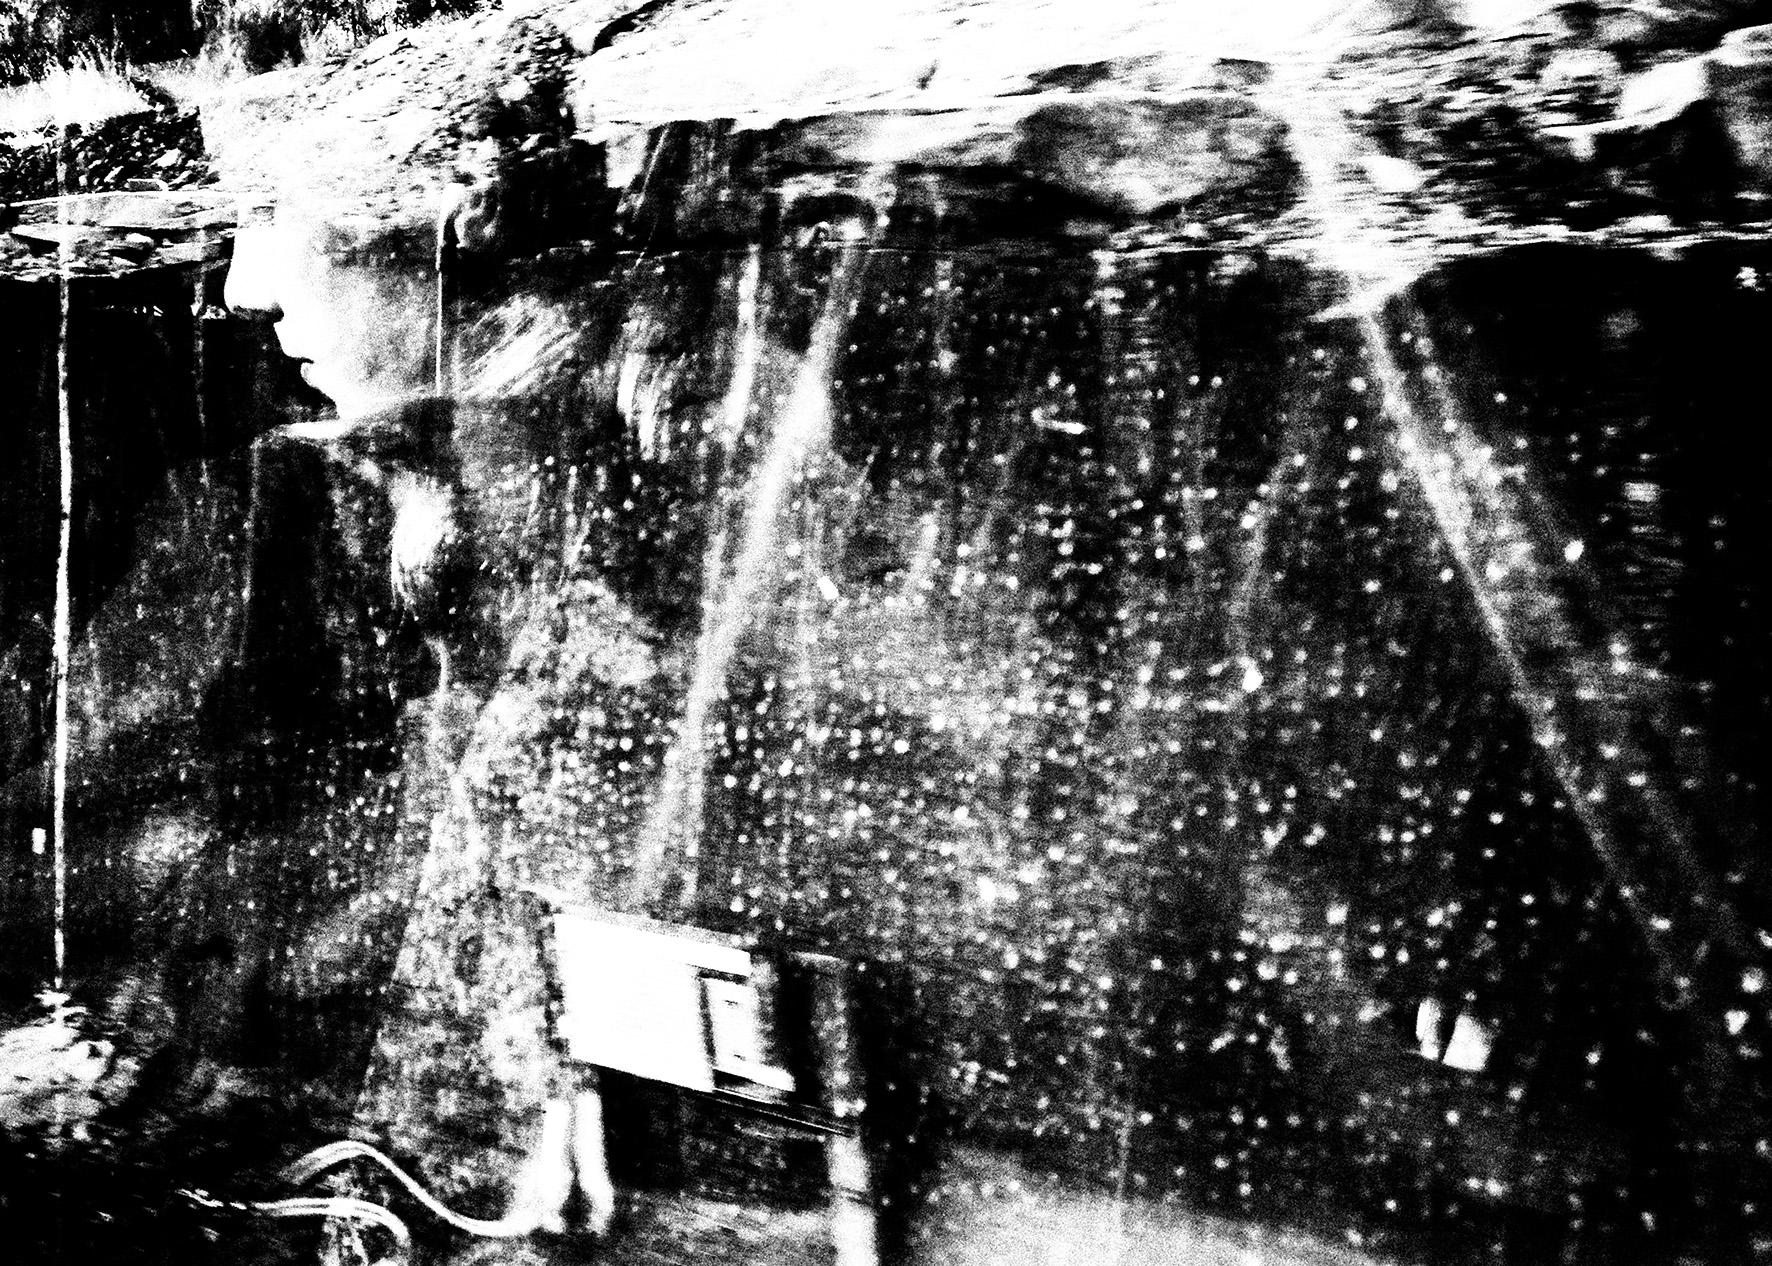 Mystery Train,2016, archival pigment on cotton rag paper, 124x85cm, AP